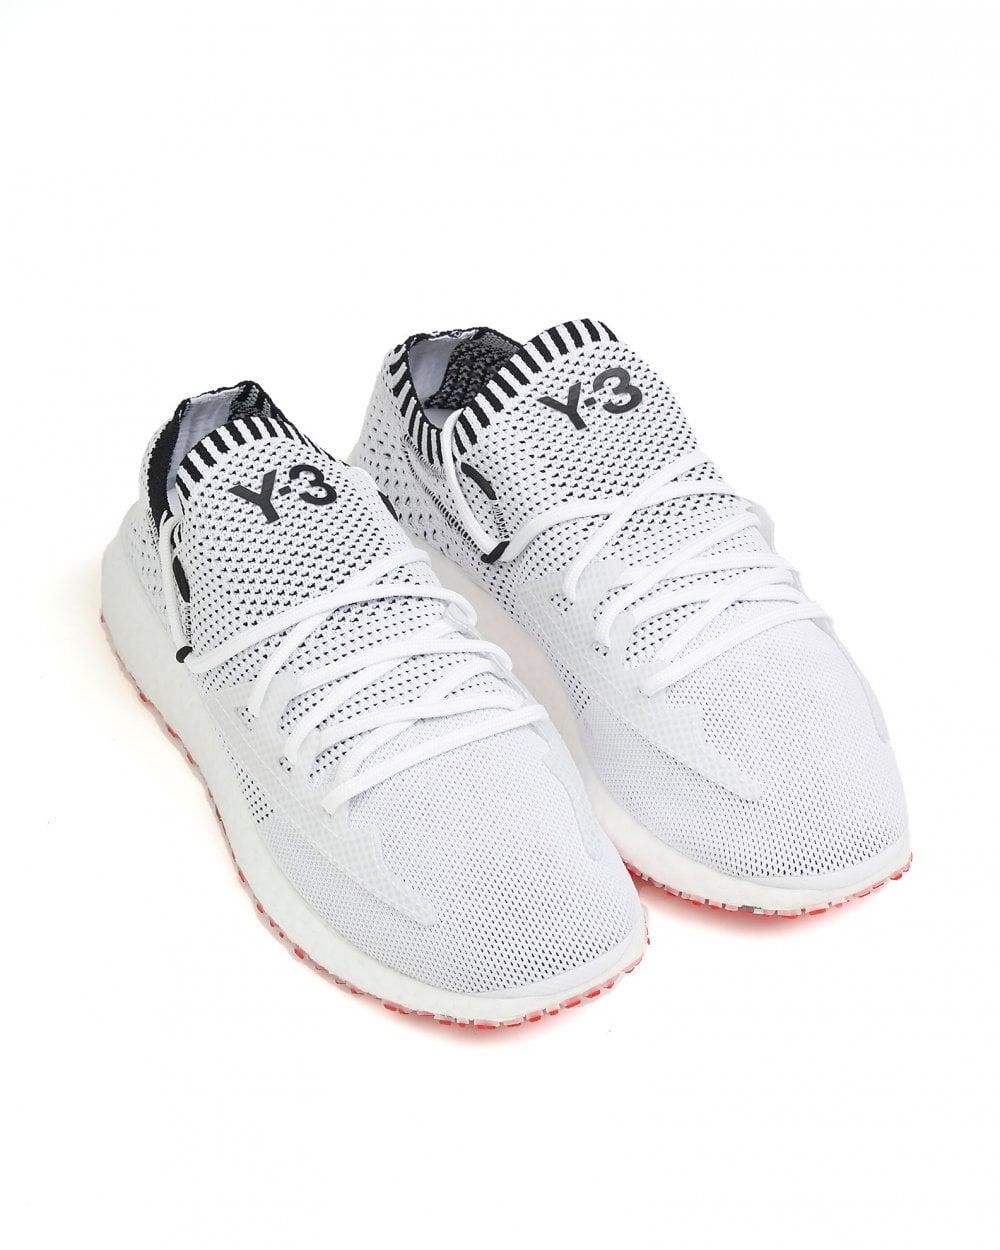 bd4659d3715d8 Y-3 Mens White Sneakers